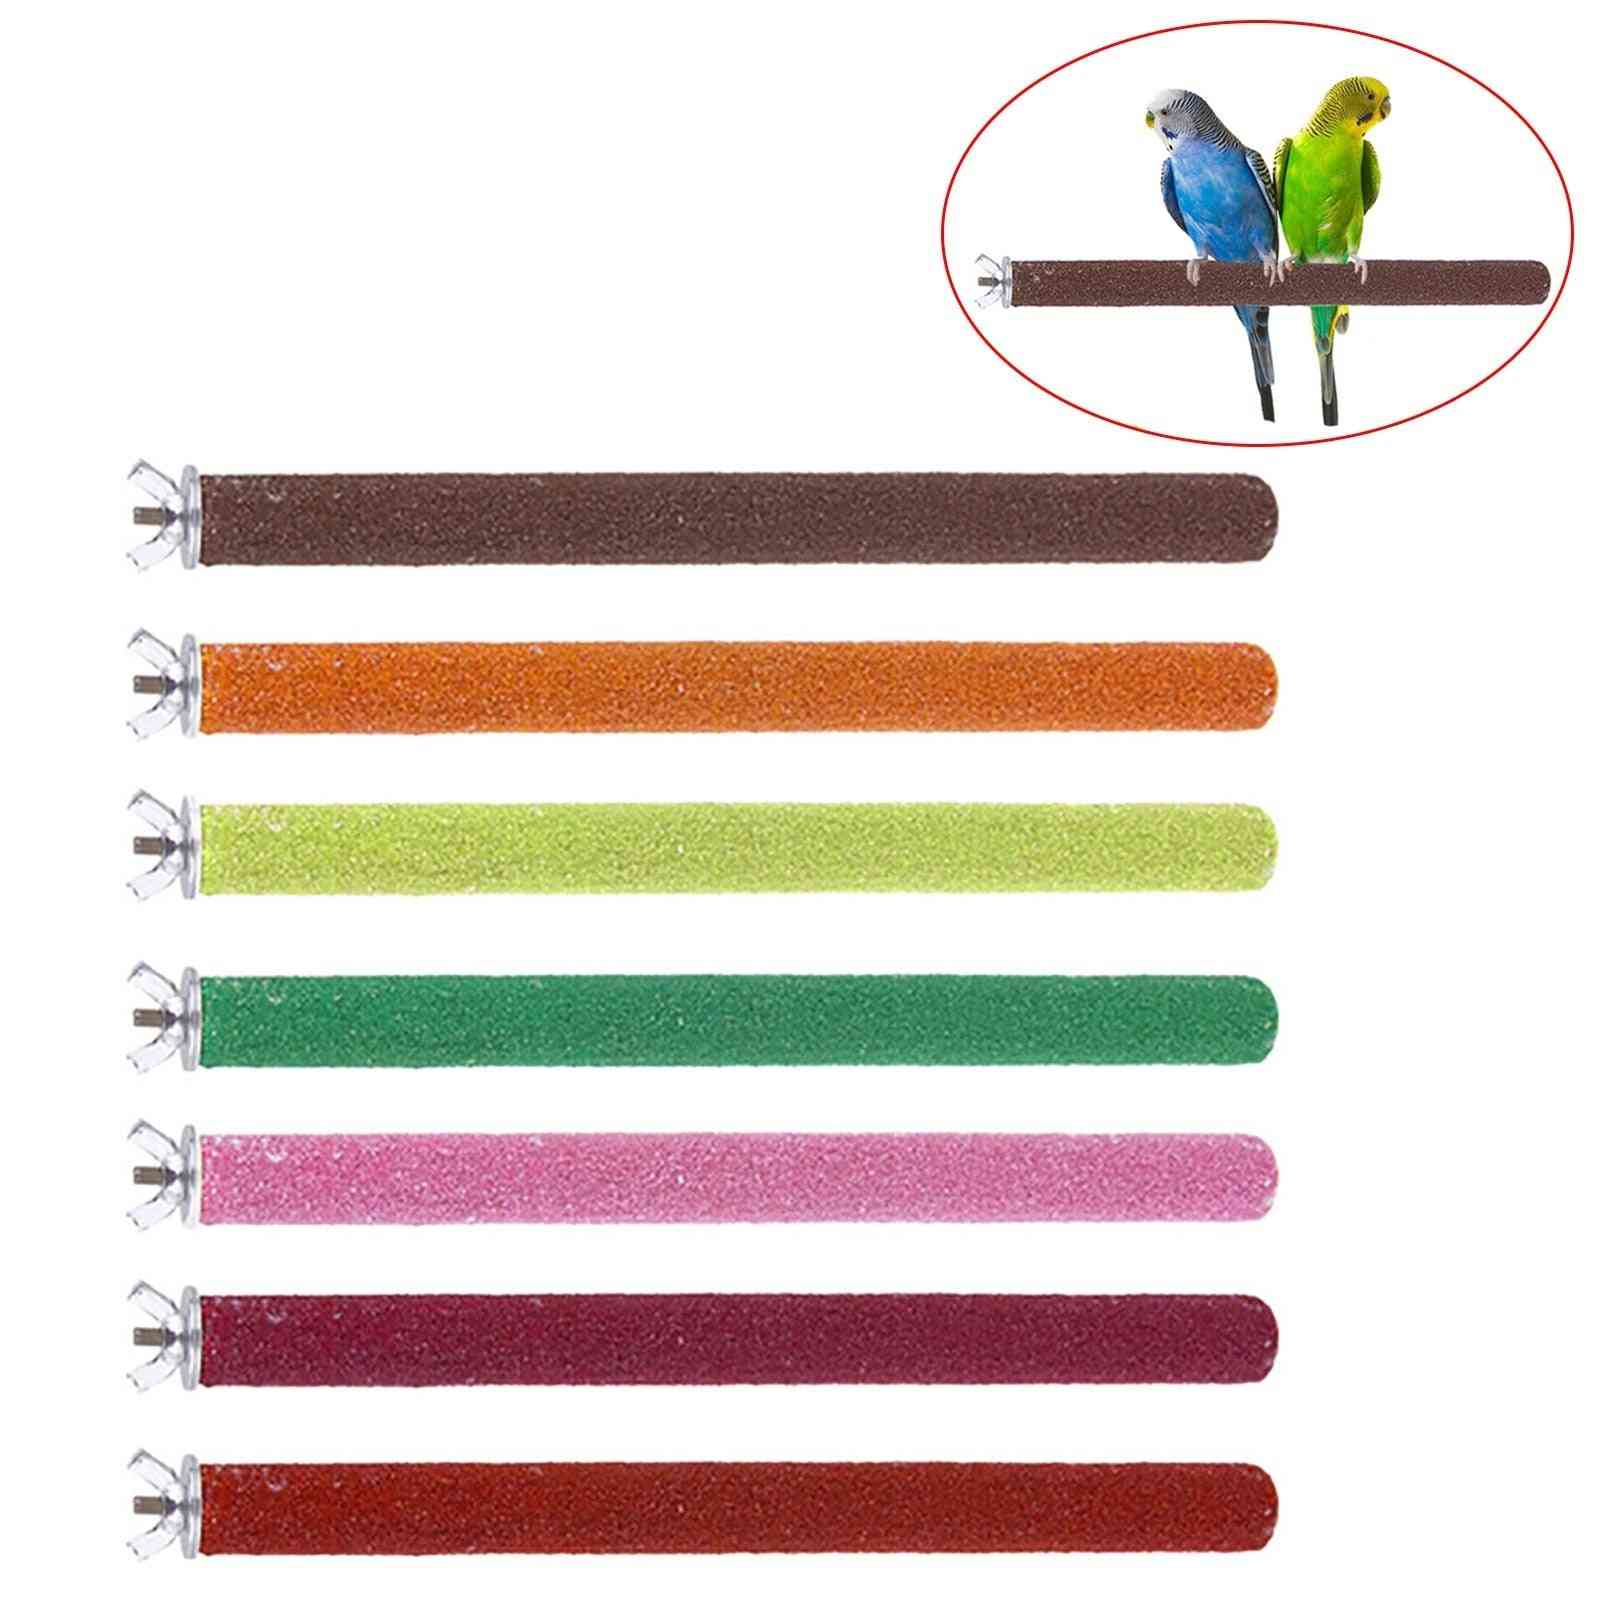 Bird Parrot Perch Stand Holder - Grinding Claw Pet Cage Platform Accessories Chew Toy Bird Supplies